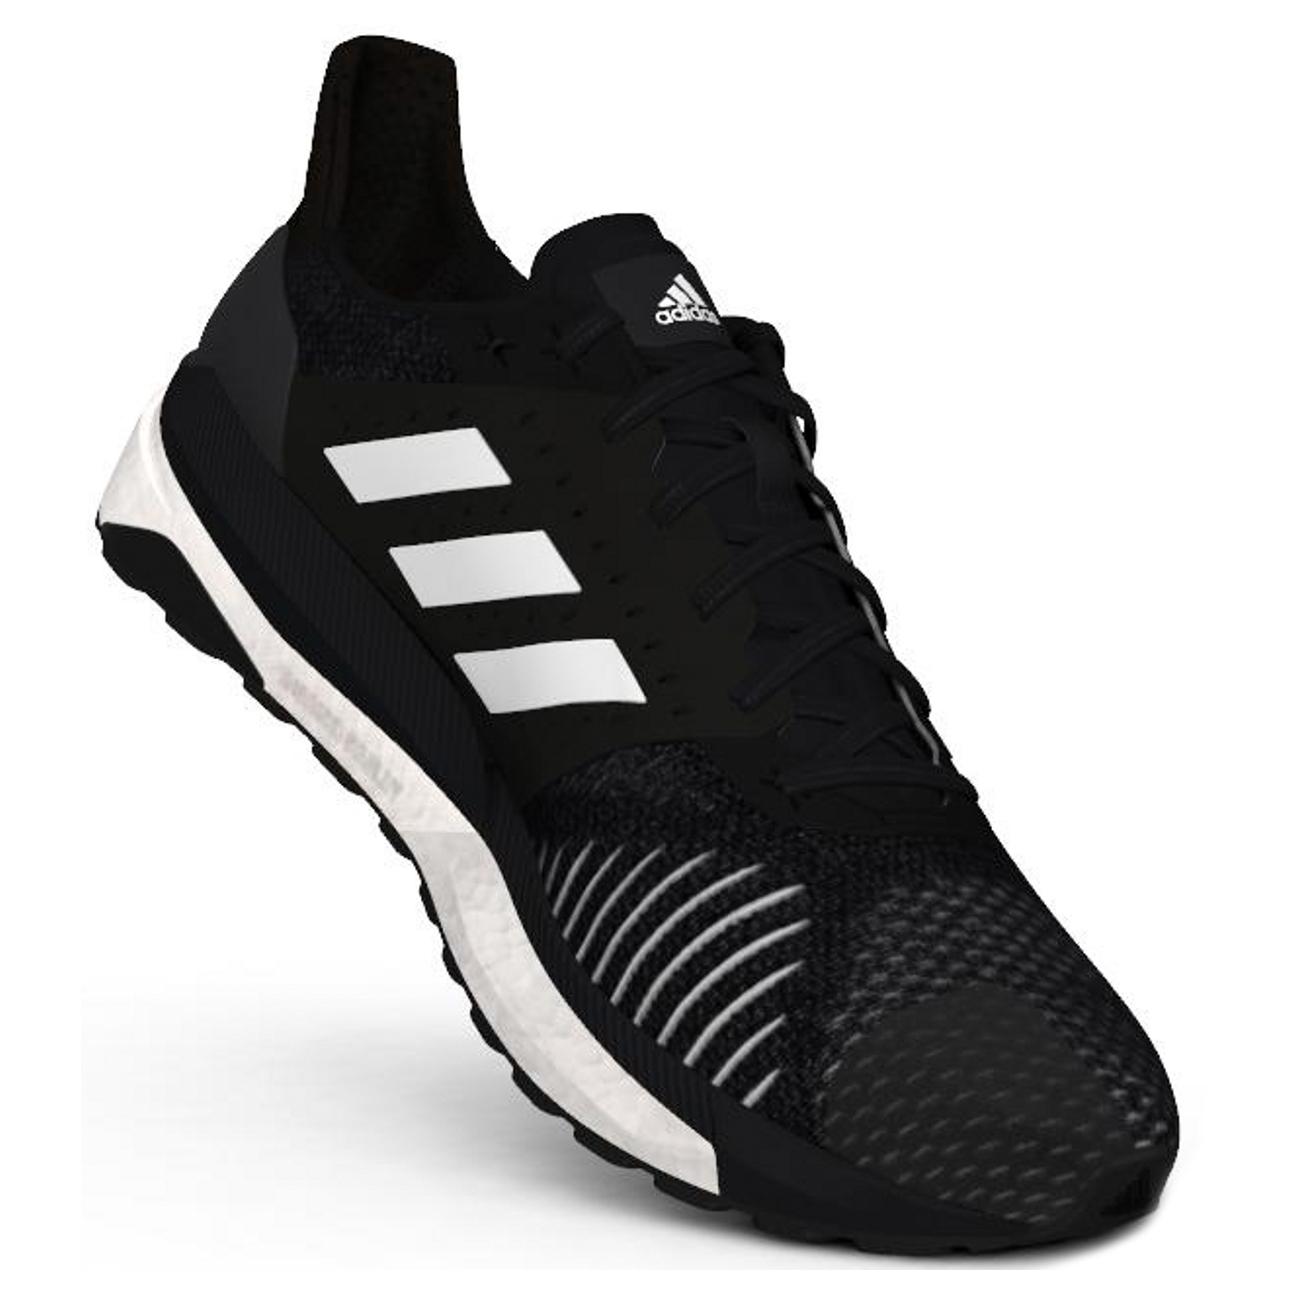 on sale 679b0 99746 adidas - Solar Glide ST - Chaussures de running ...